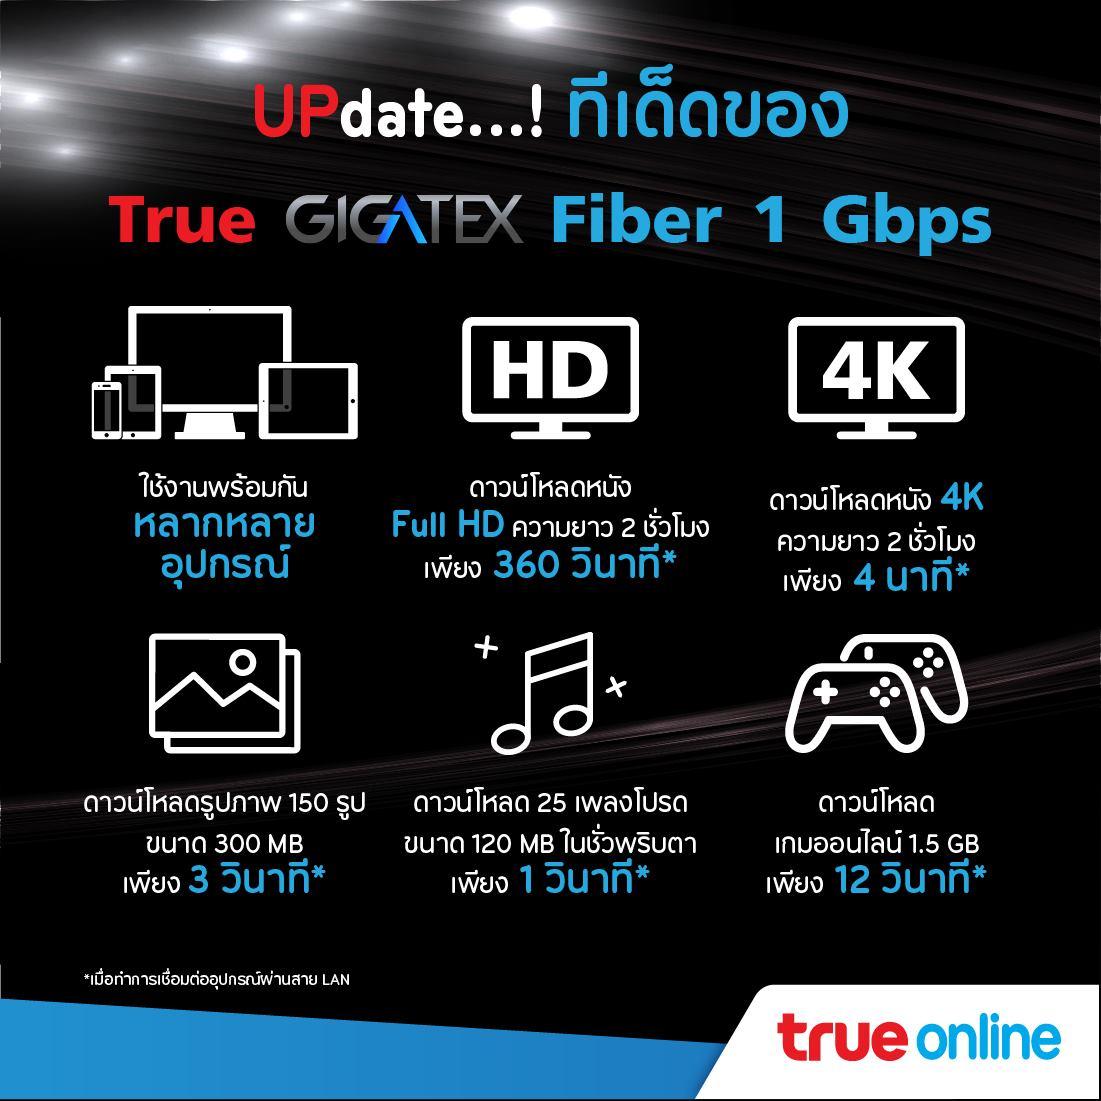 True-Fiber-Up-Your-Life